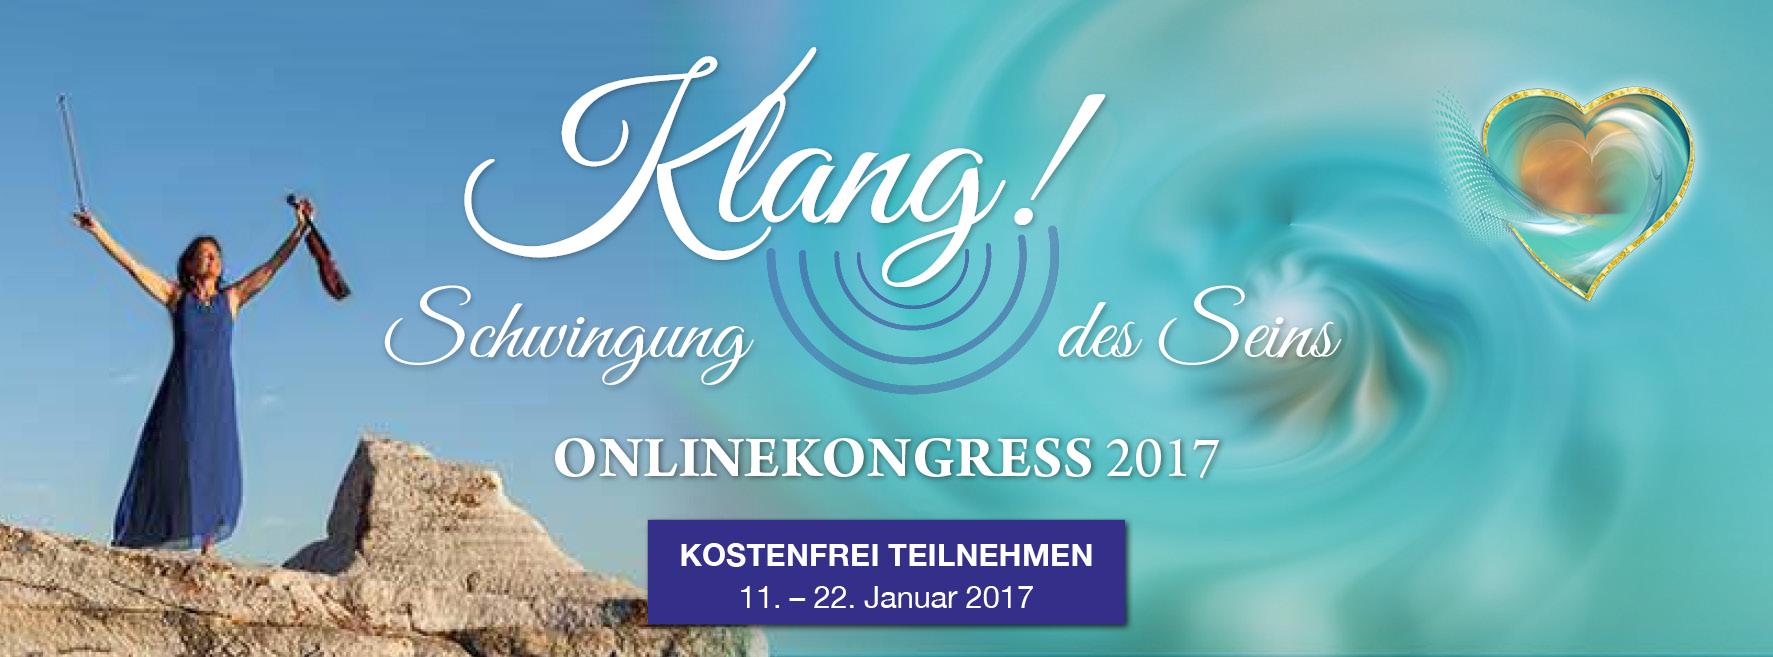 Online-Kongress-KLANGSchwingung-des-Seins